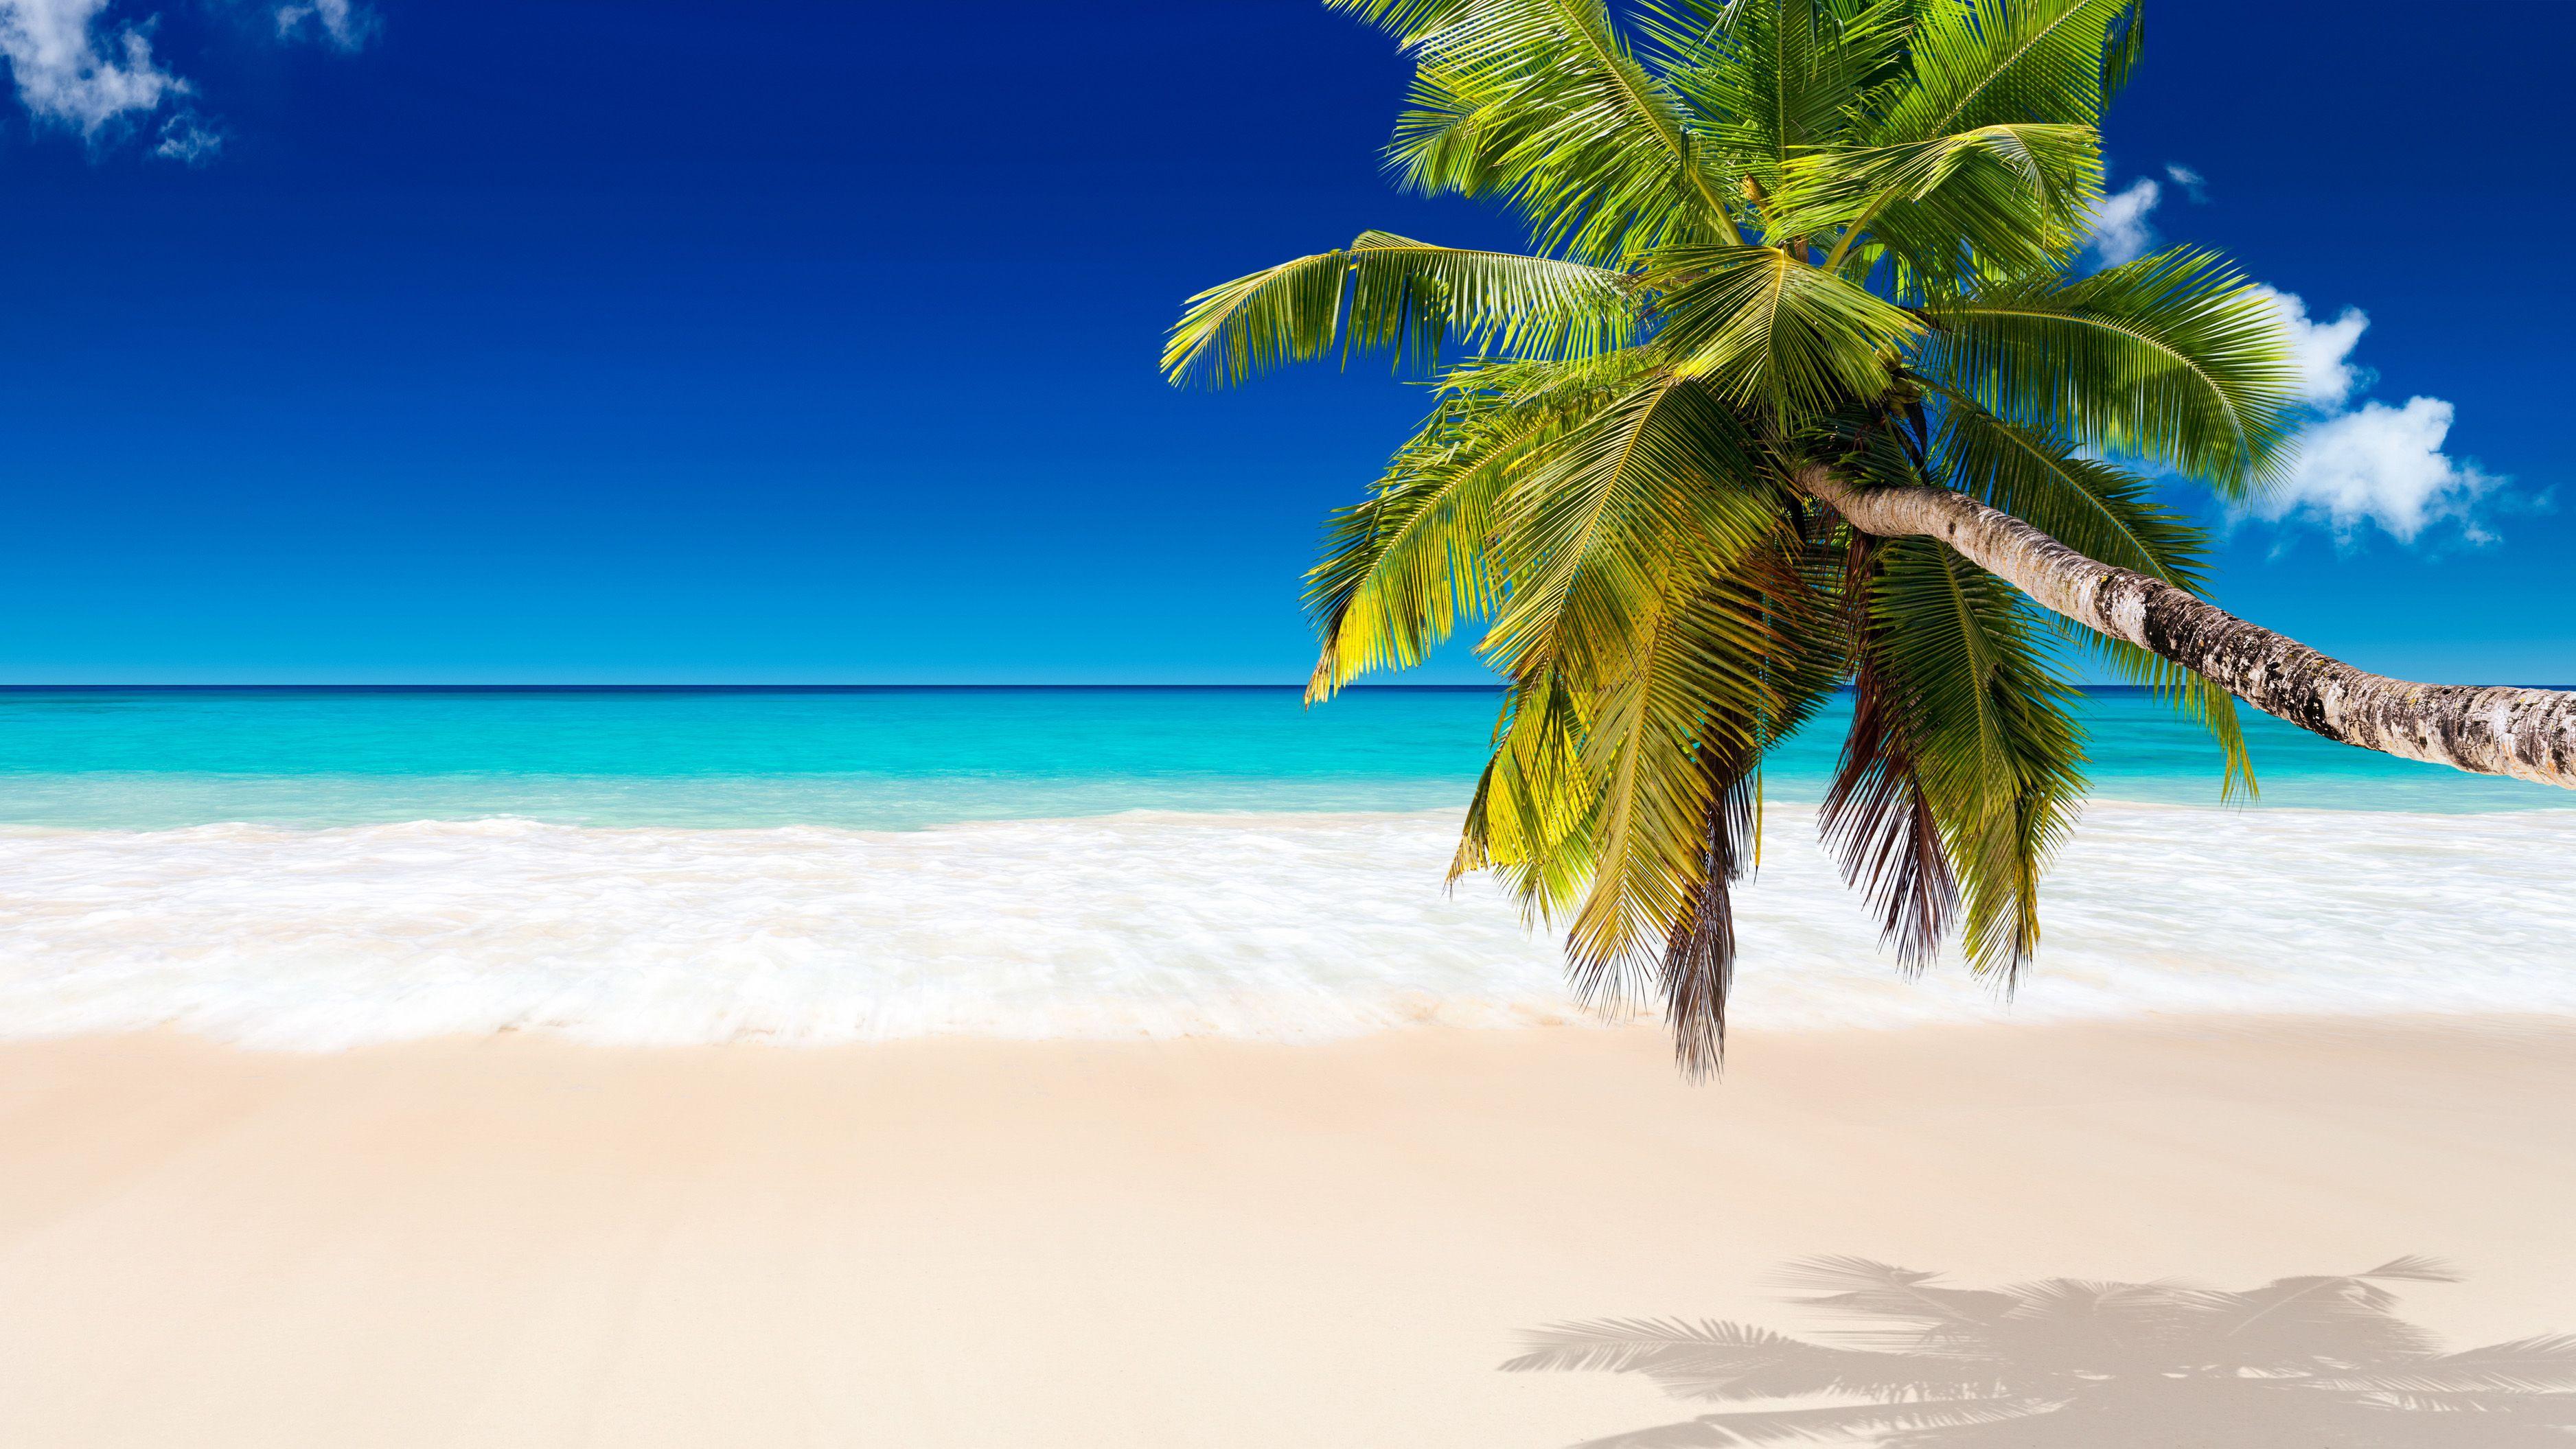 Tropical Beach Background Coconut Trees Hd Wallpapers Hd Pics Beach Background Beach Wallpaper Tree Hd Wallpaper